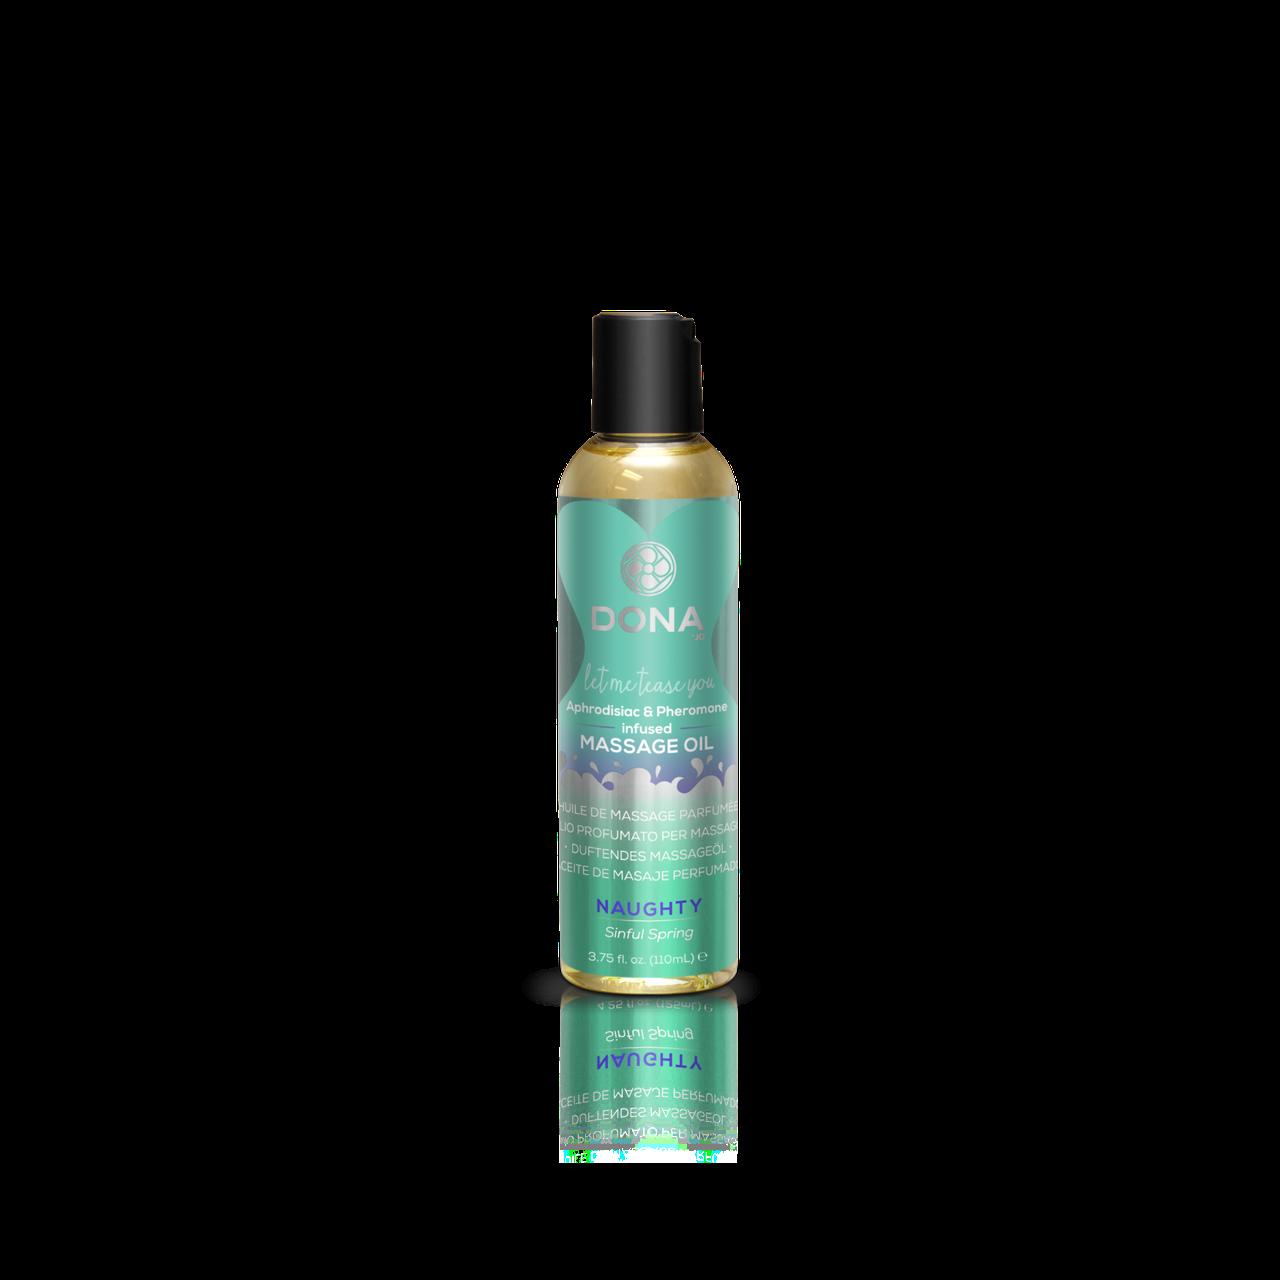 Масажне масло DONA Massage Oil NAUGHTY - SINFUL SPRING (110 мл) з феромонами і афродизіаками